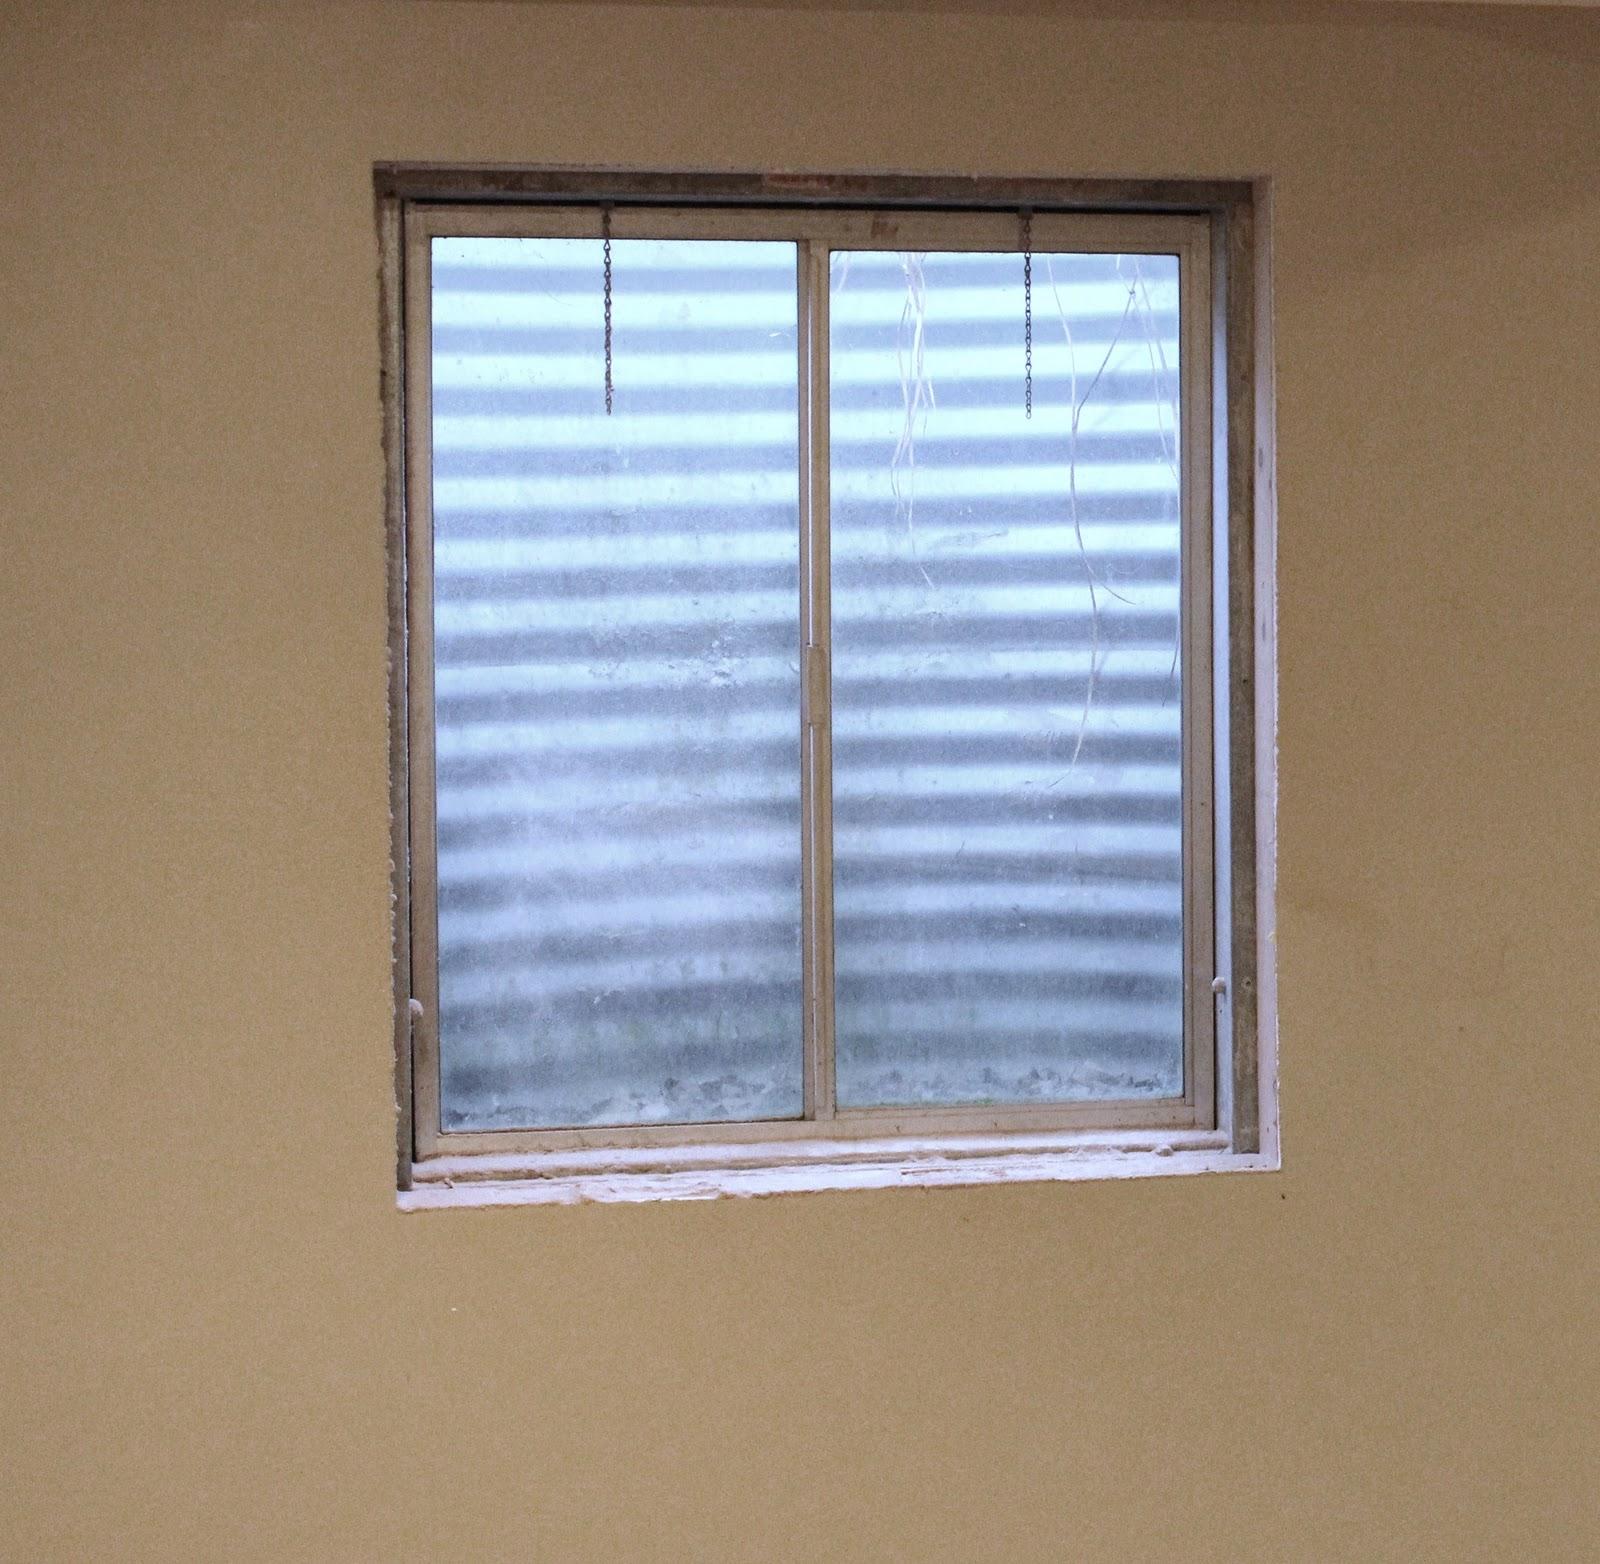 Diy interior window trim -  1f6aac Diy Interior Window Trim Or A Window Where You Want Basement Window Shades 6127